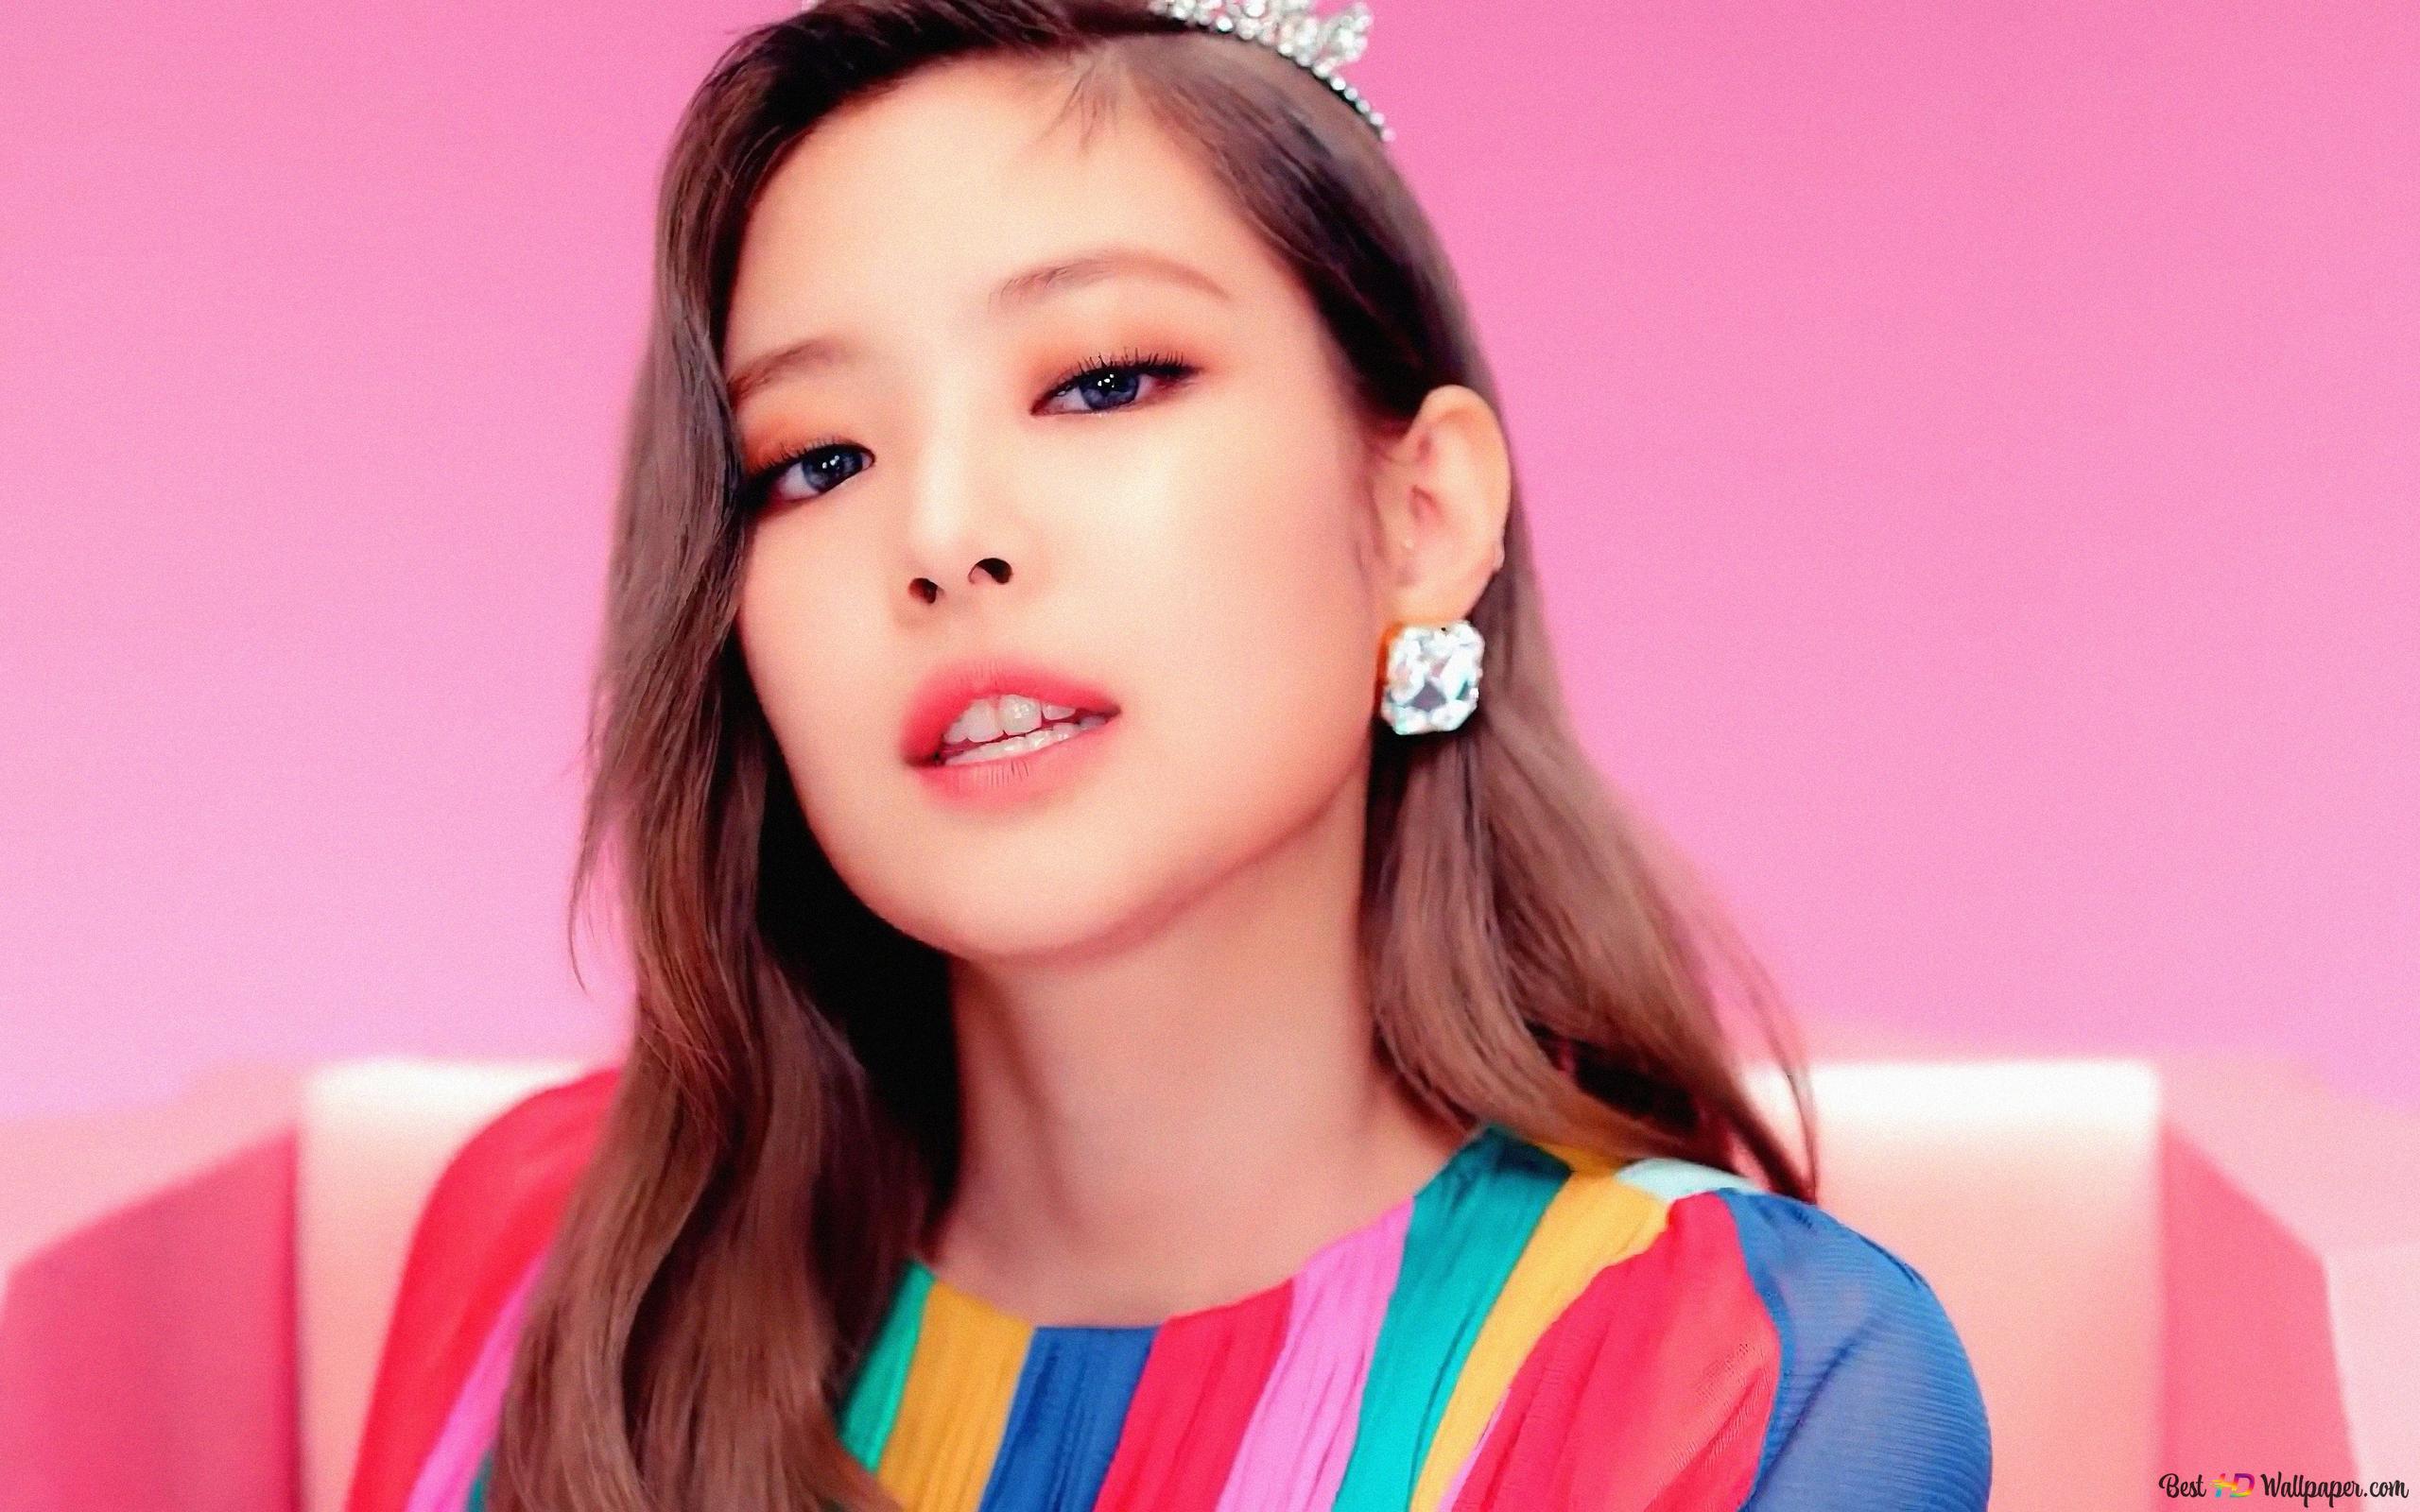 Gorgeous Jennie Kim From Blackpink Hd Wallpaper Download